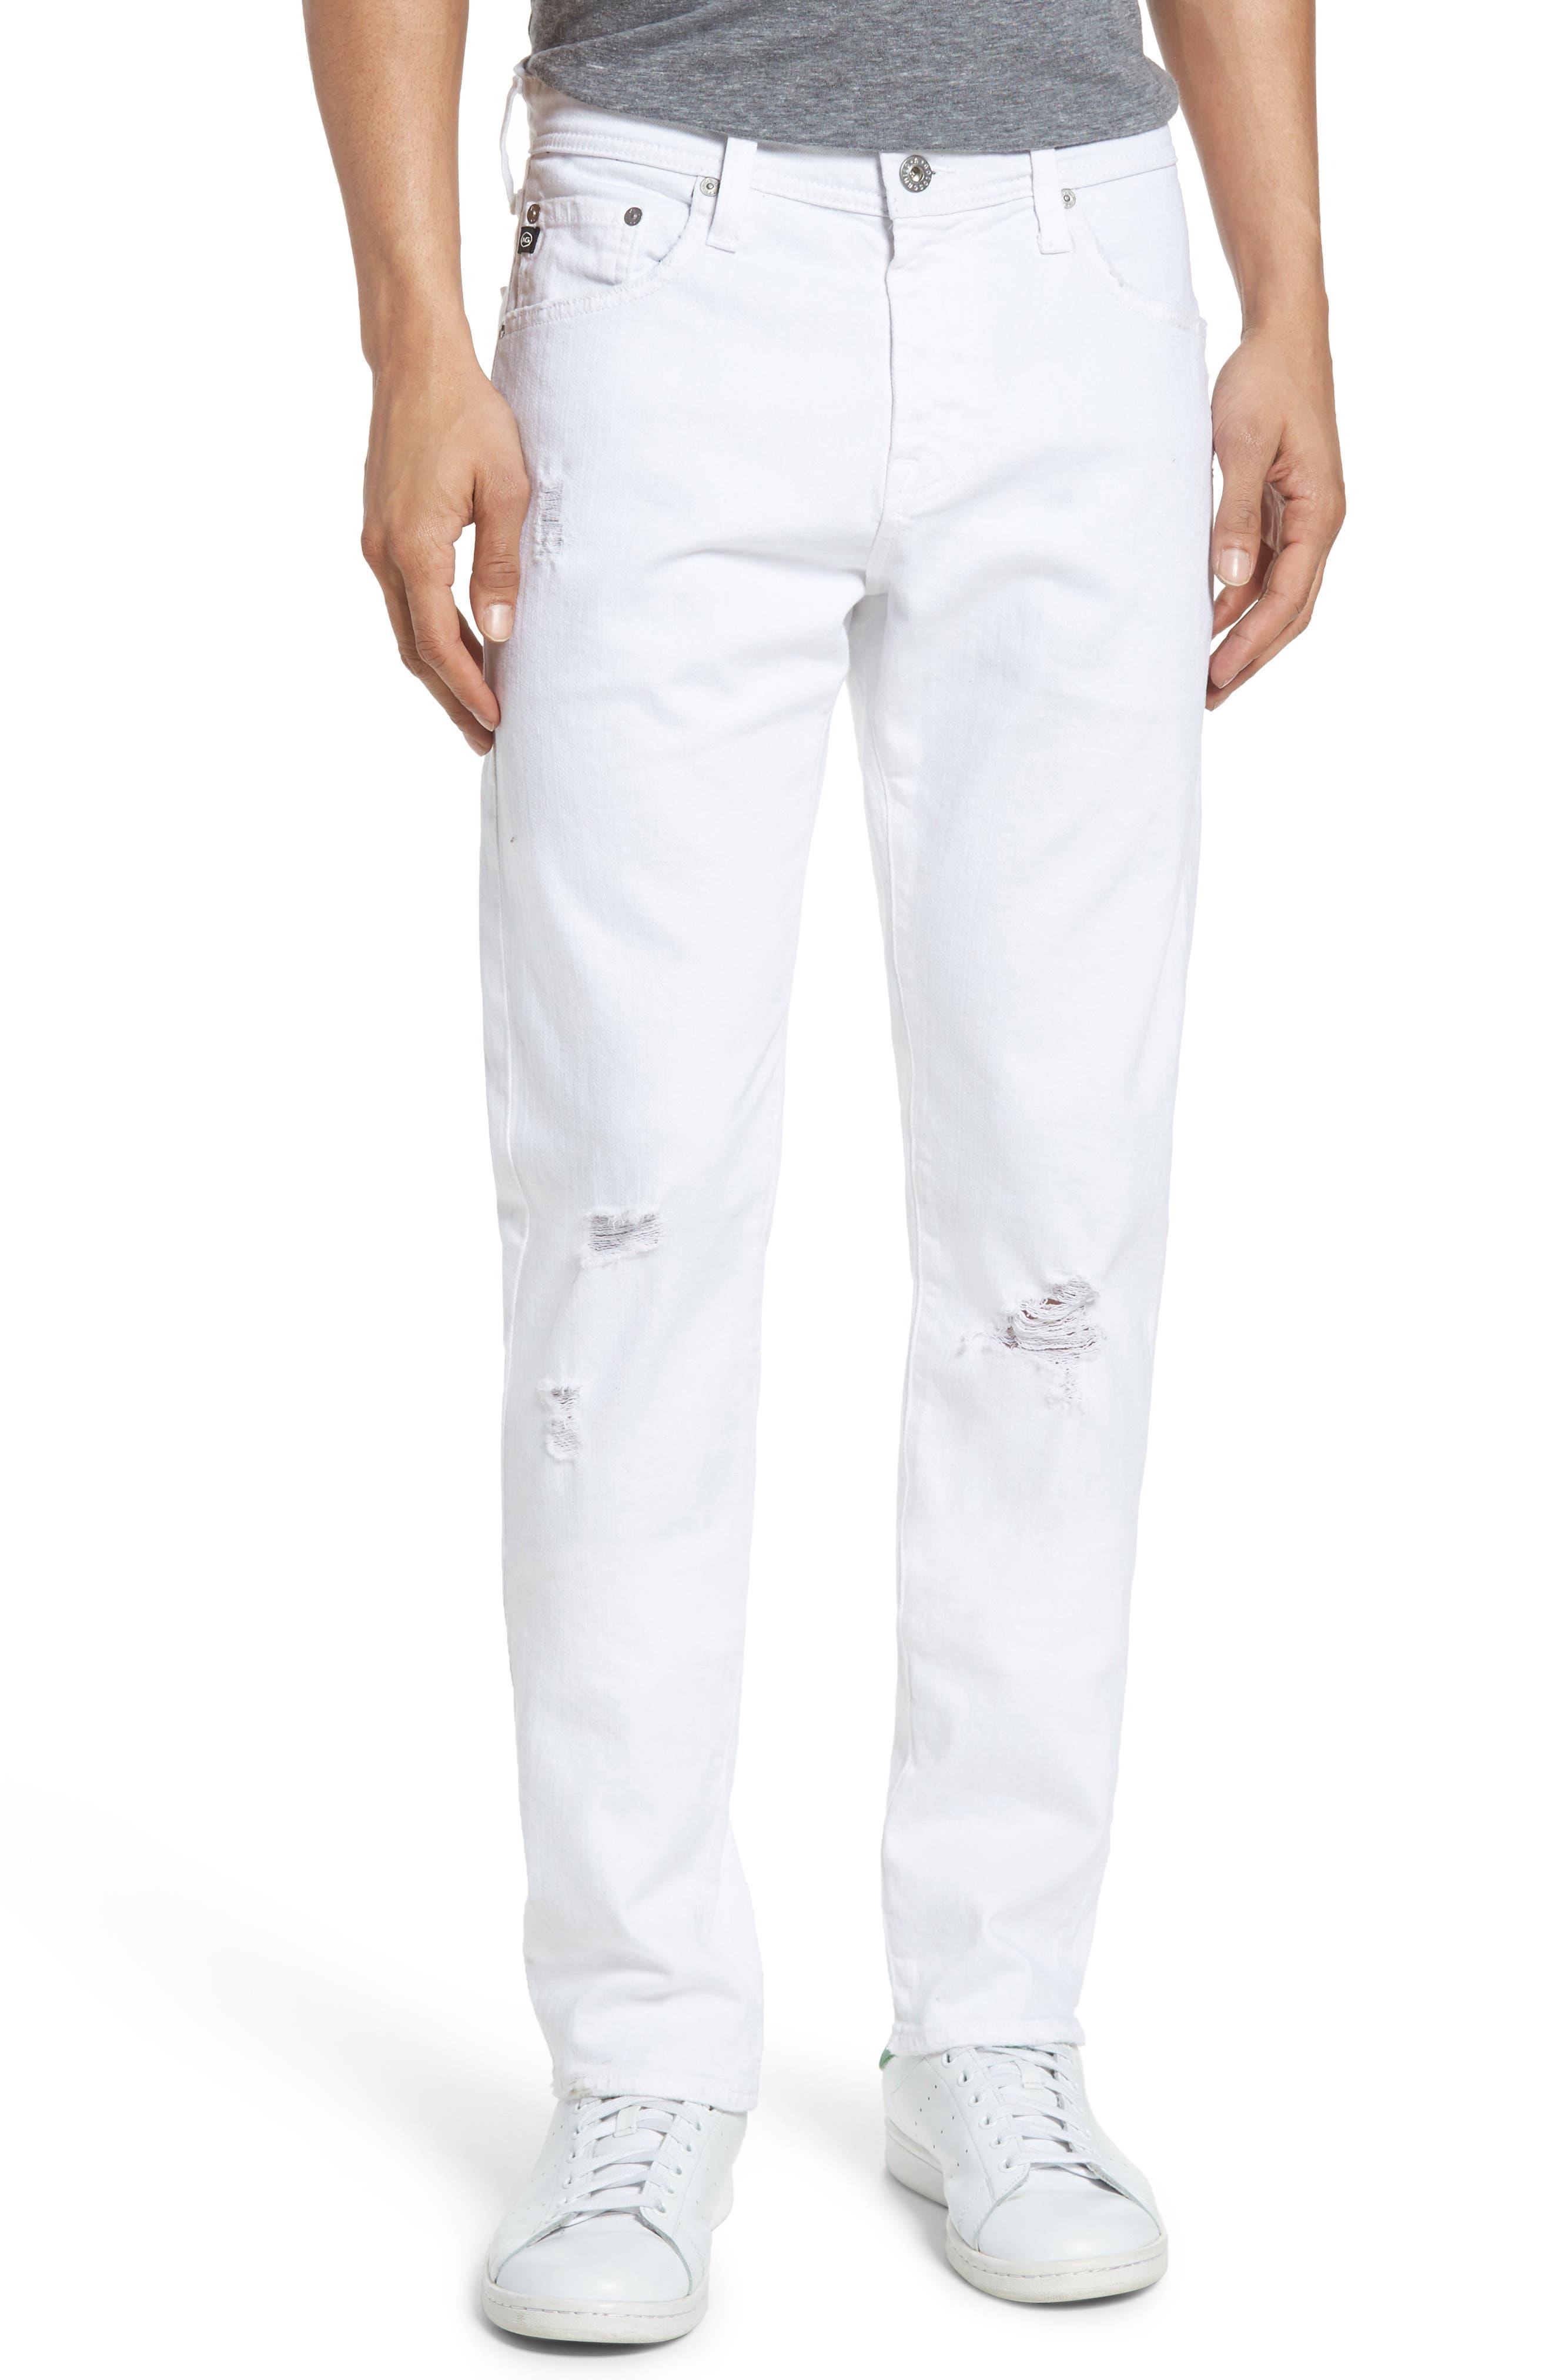 Alternate Image 1 Selected - AG Tellis Slim Fit Jeans (Ragged White)